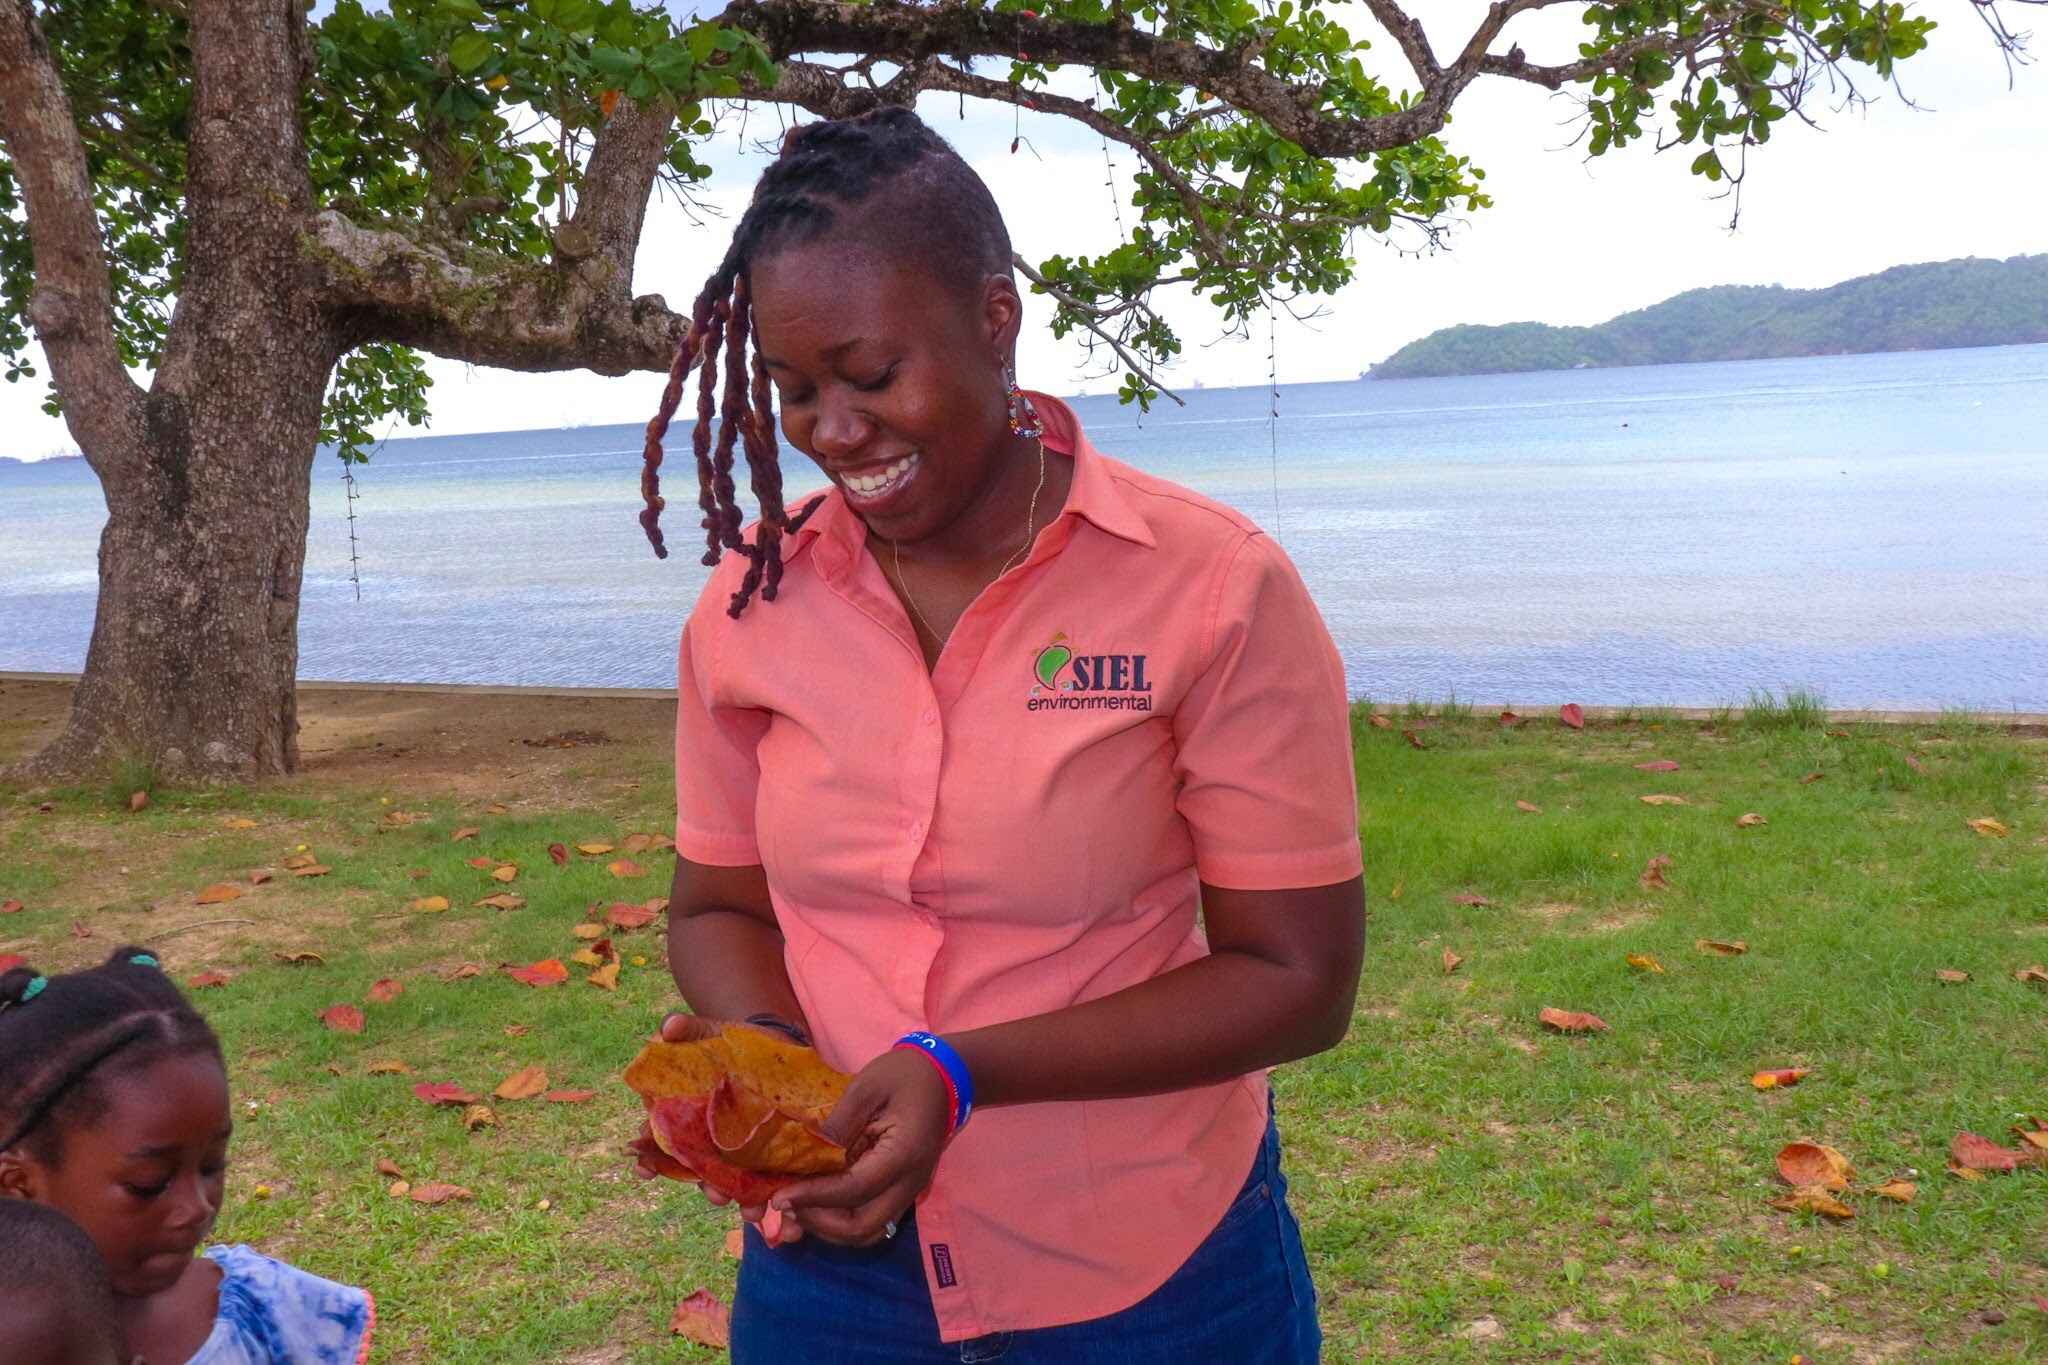 Meet Sian Cuffy-Young of Siel Environmental